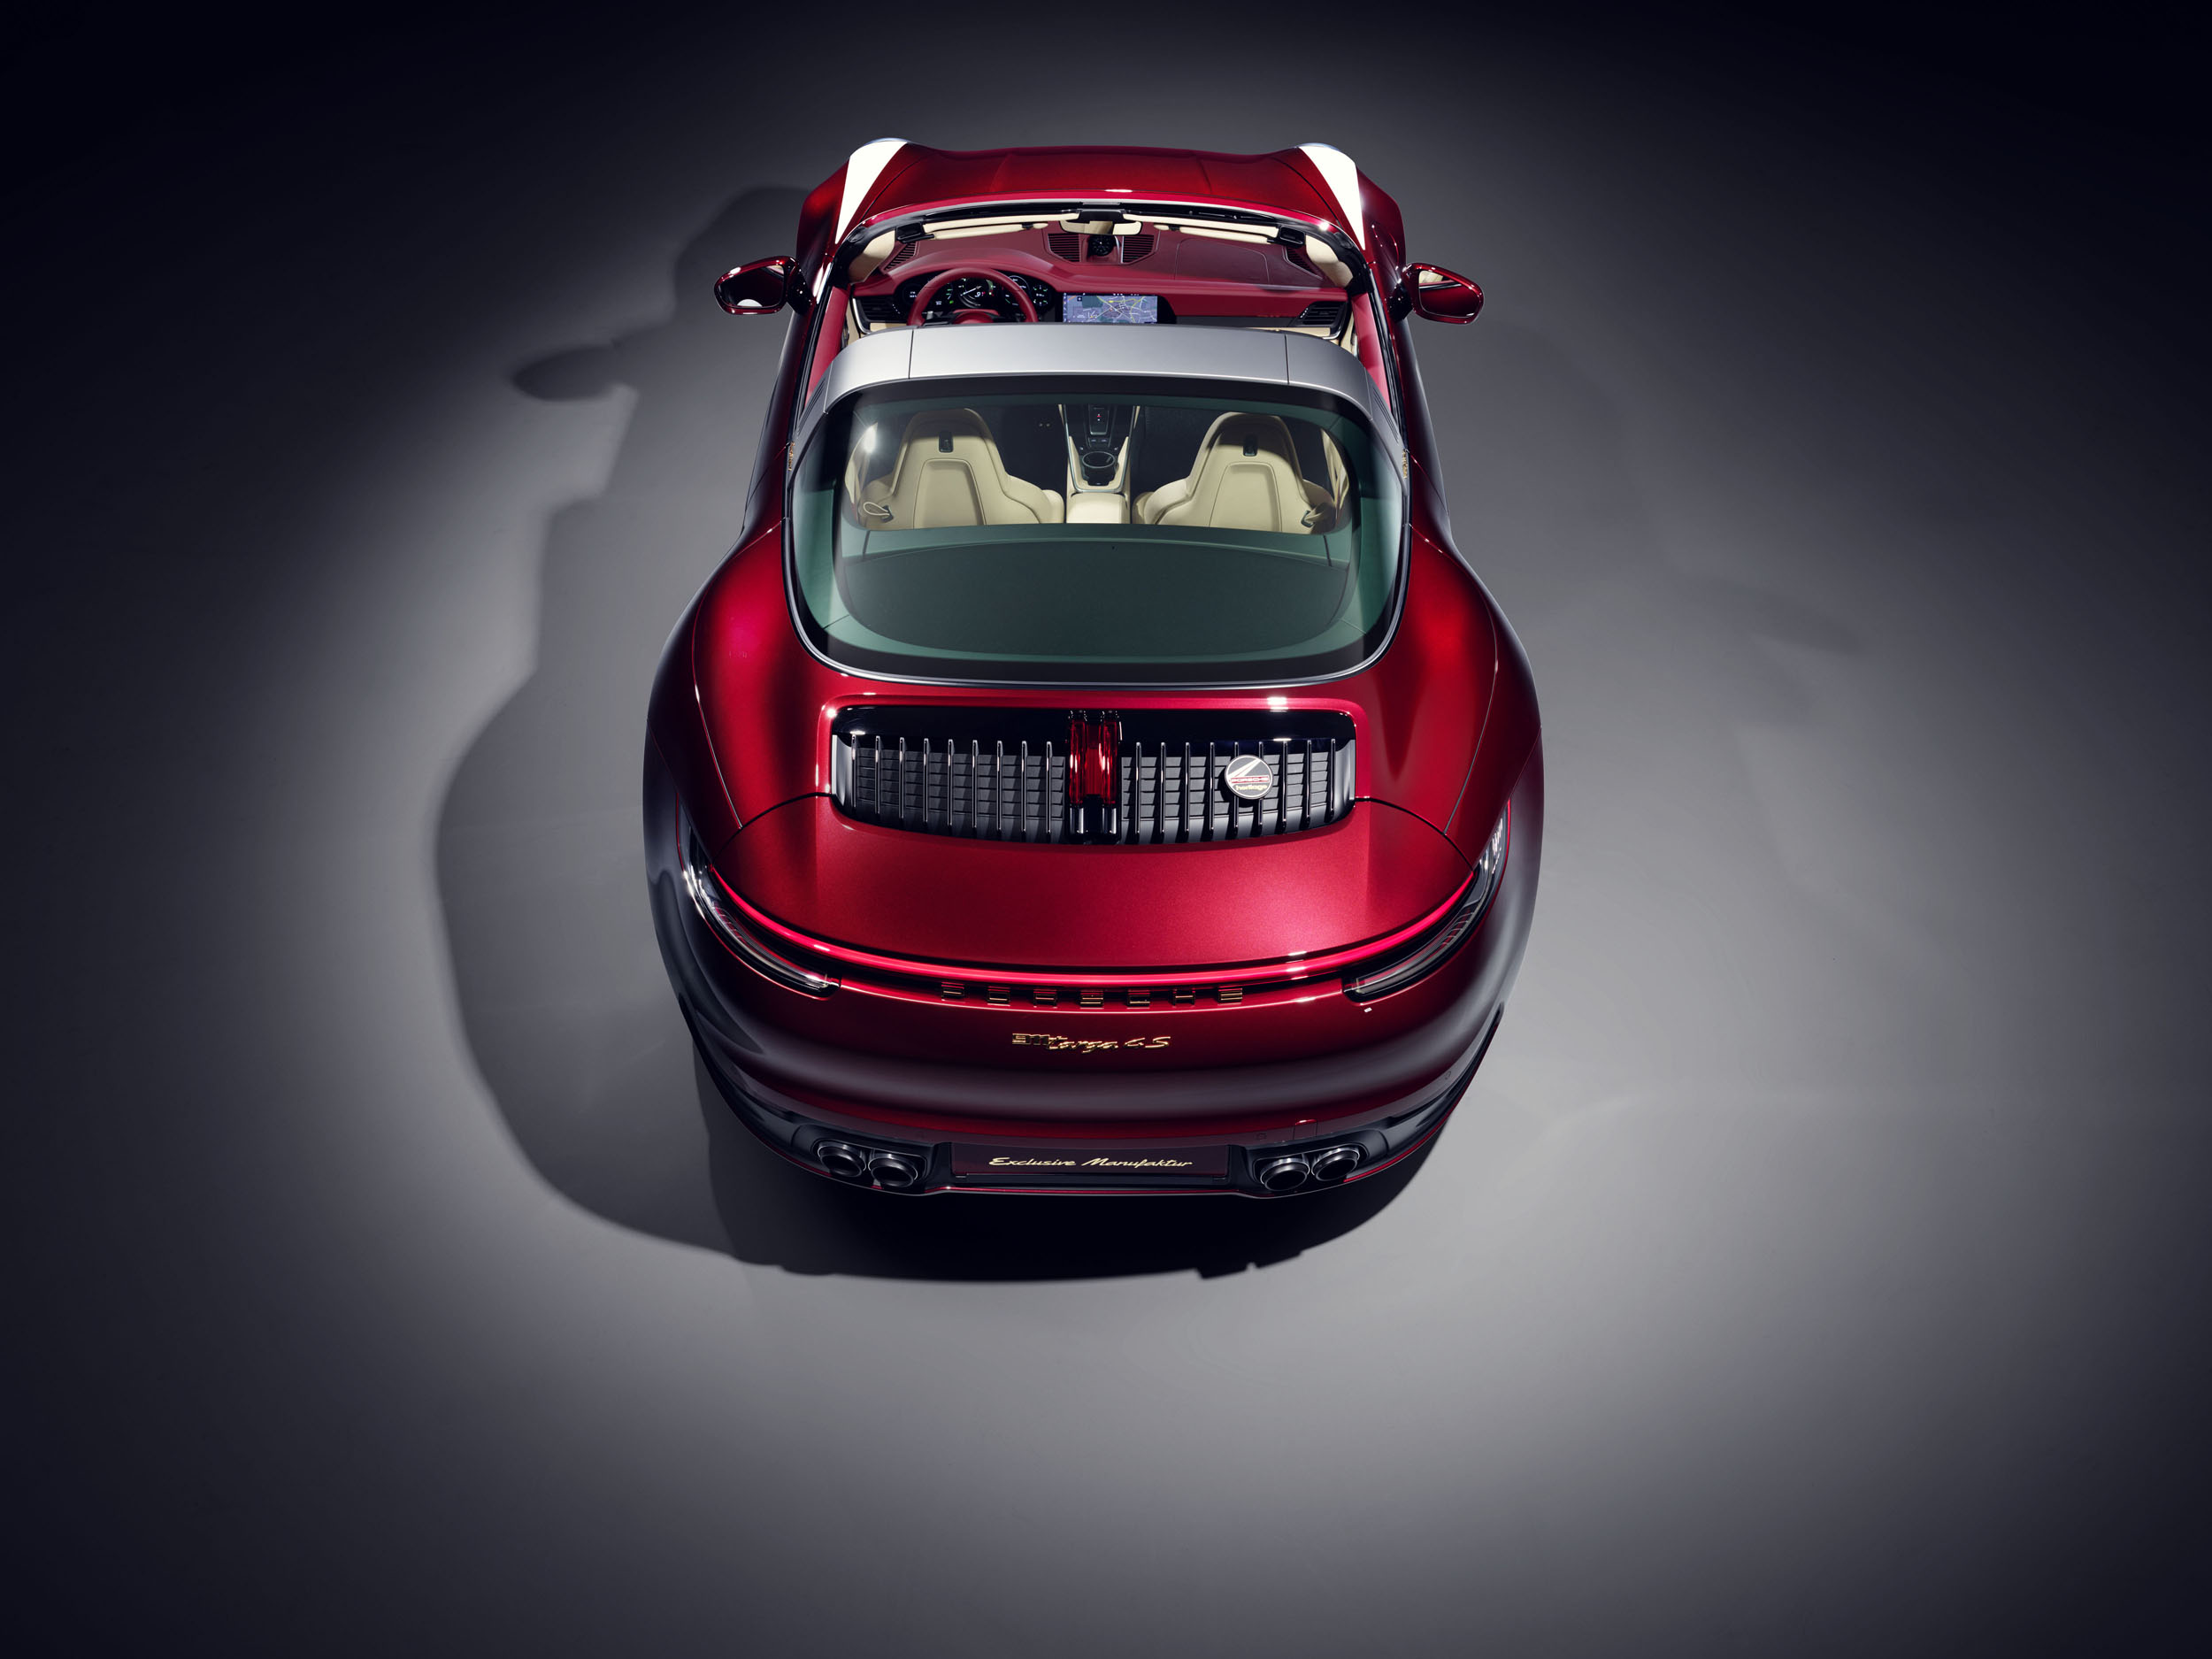 Porsche 911 Targa 4S Heritage Design Edition, rear